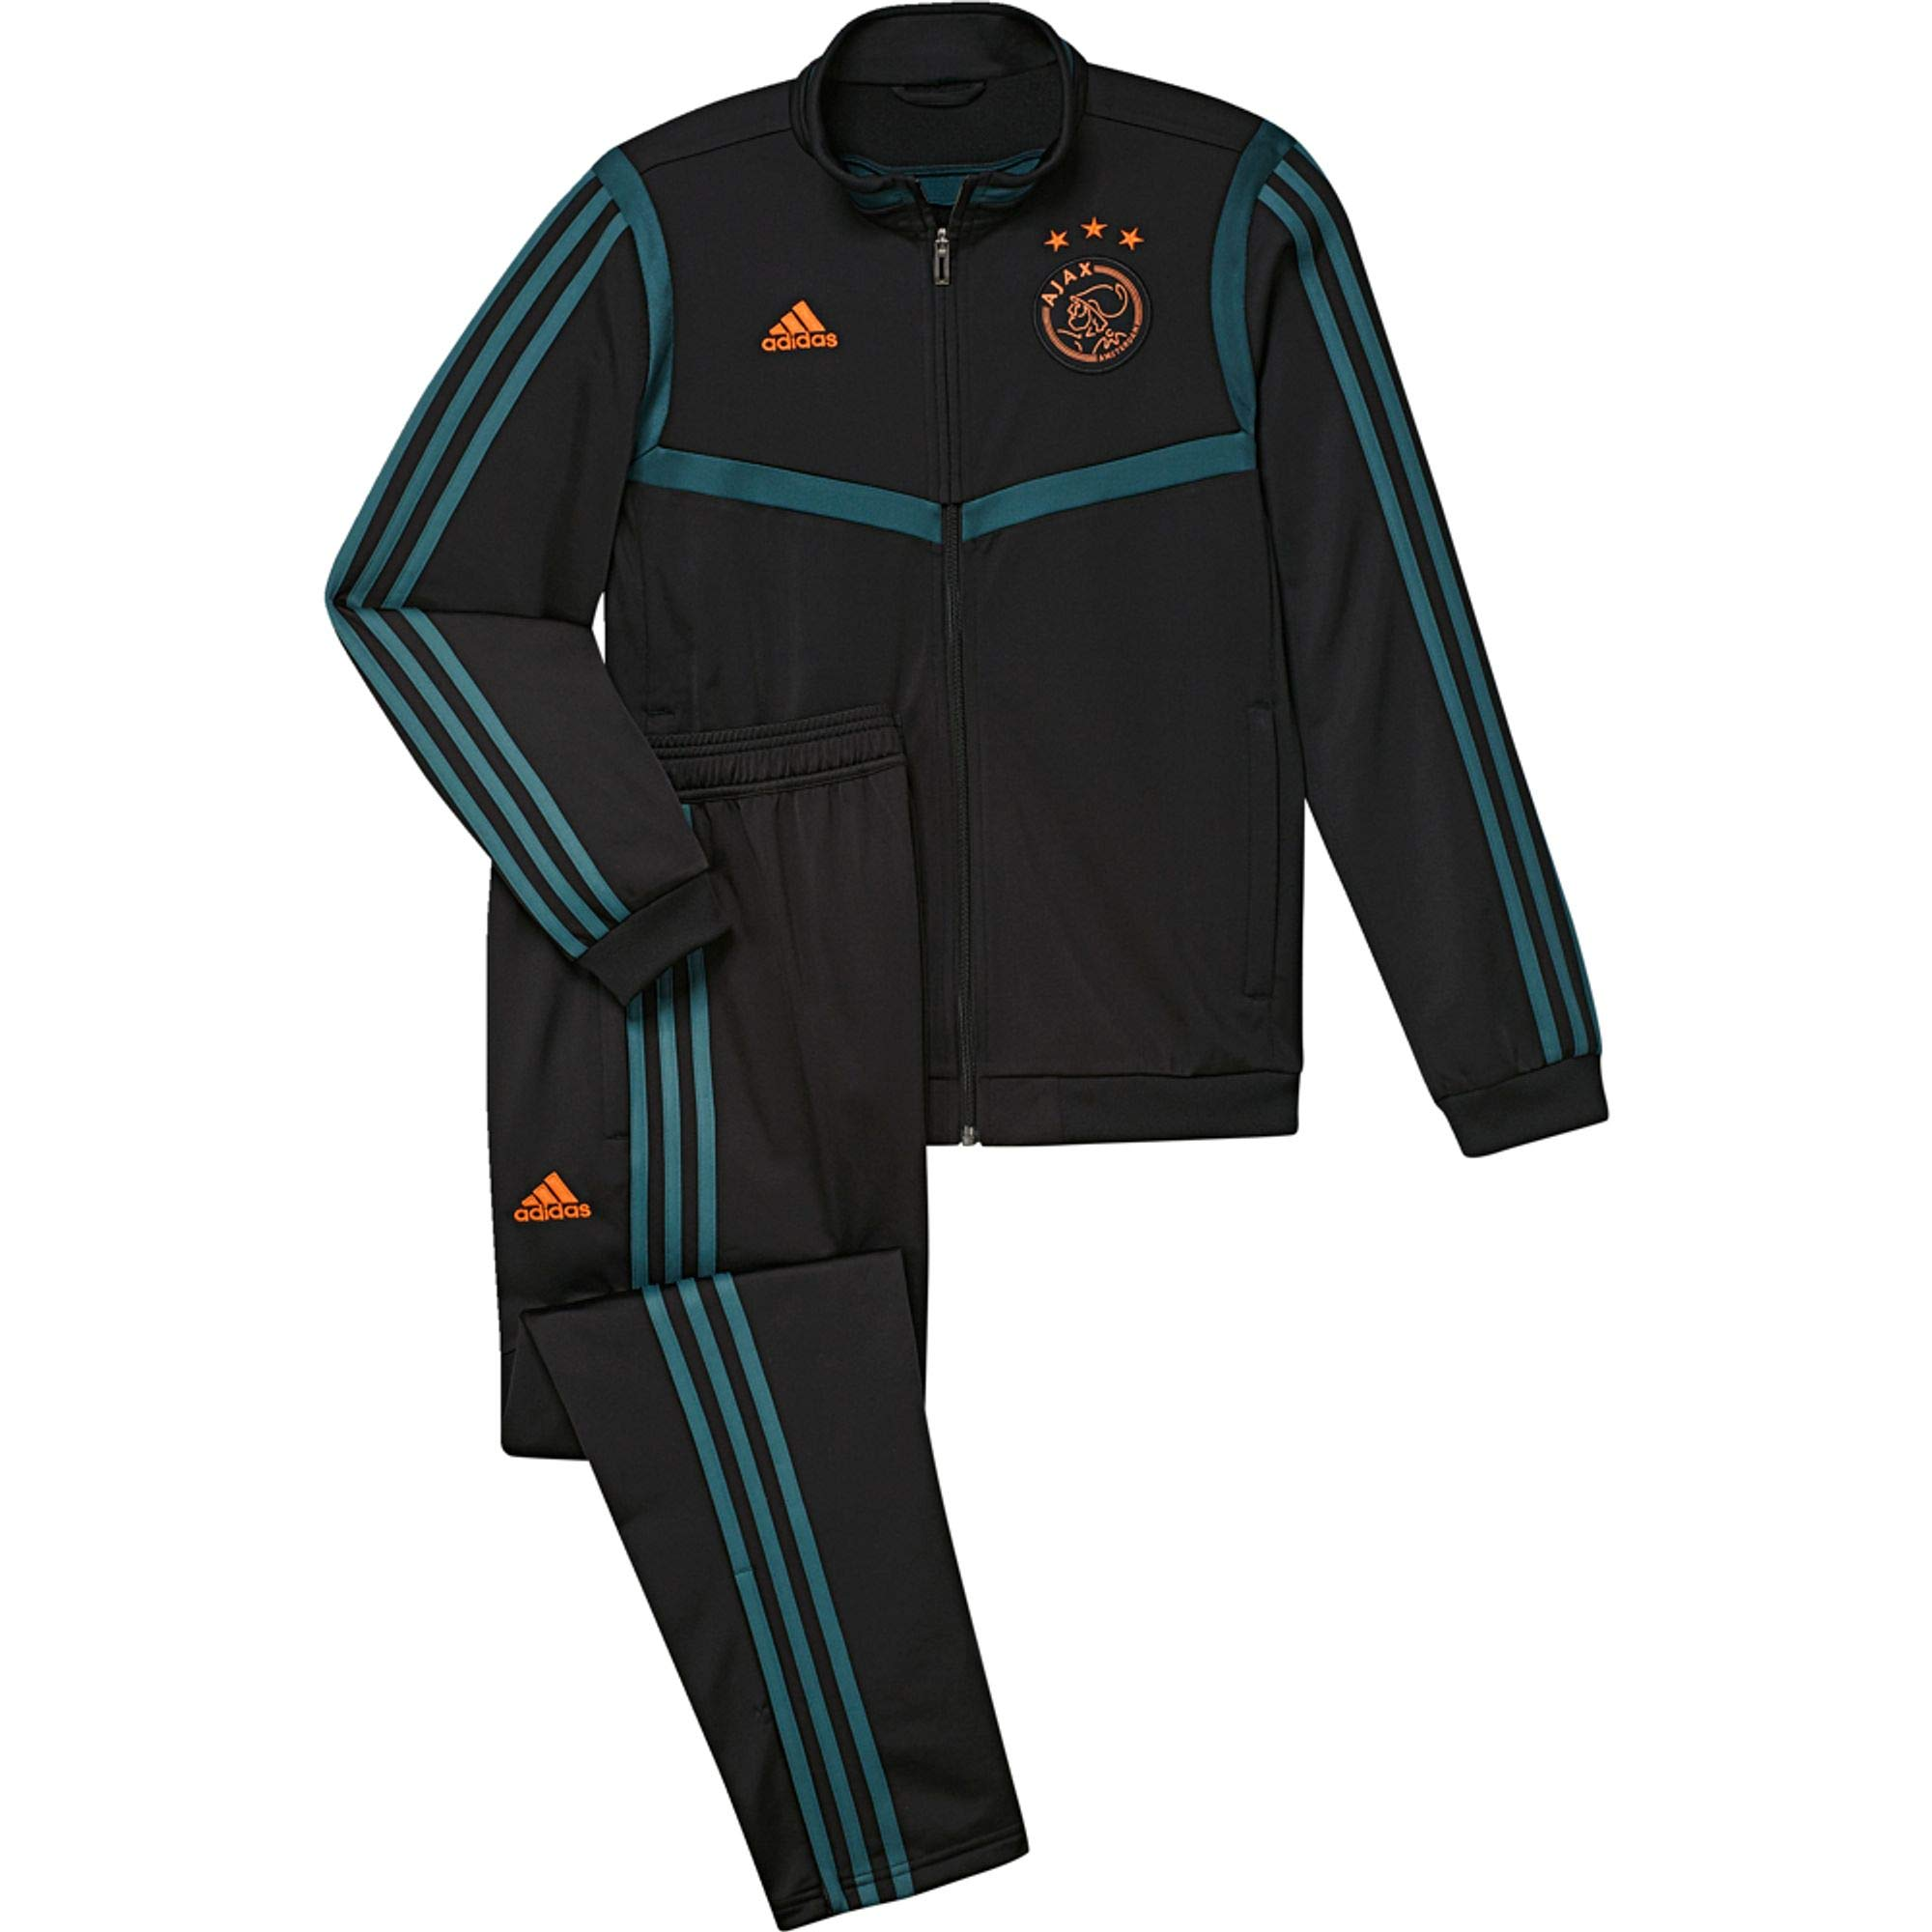 adidas AJAX PES Suit Y Chándal, Unisex niños, Negro/Vertec, 176 ...